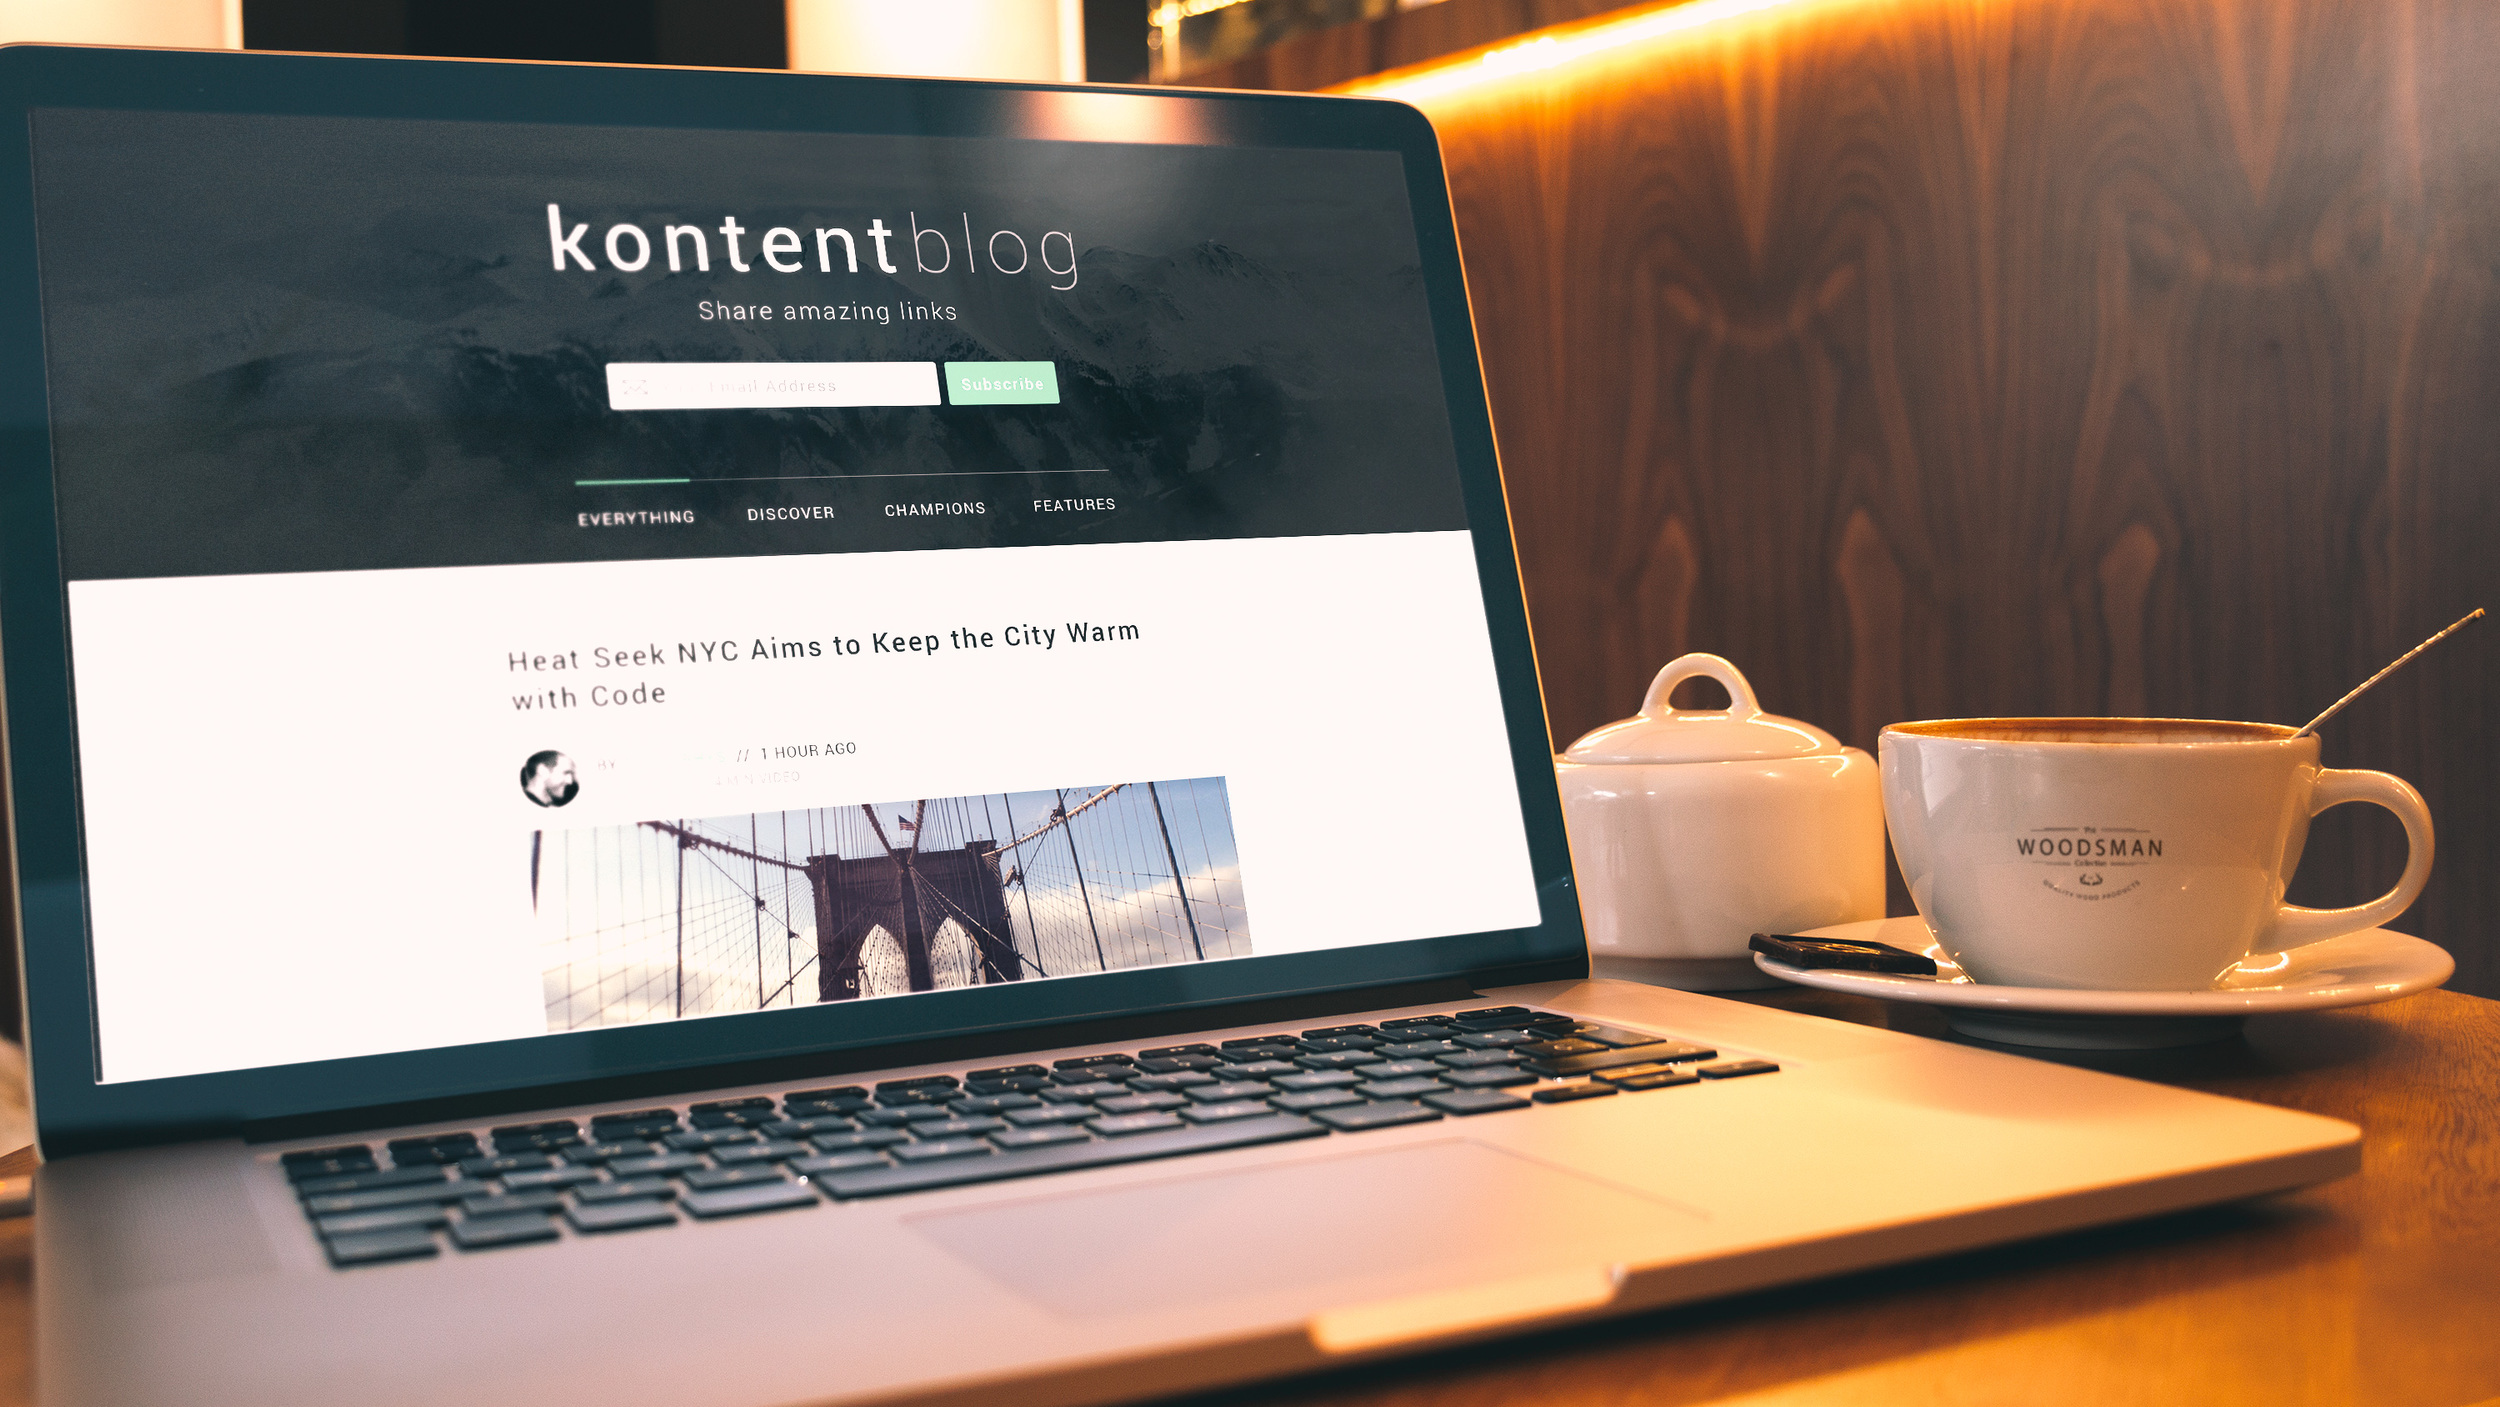 Kontent Blog